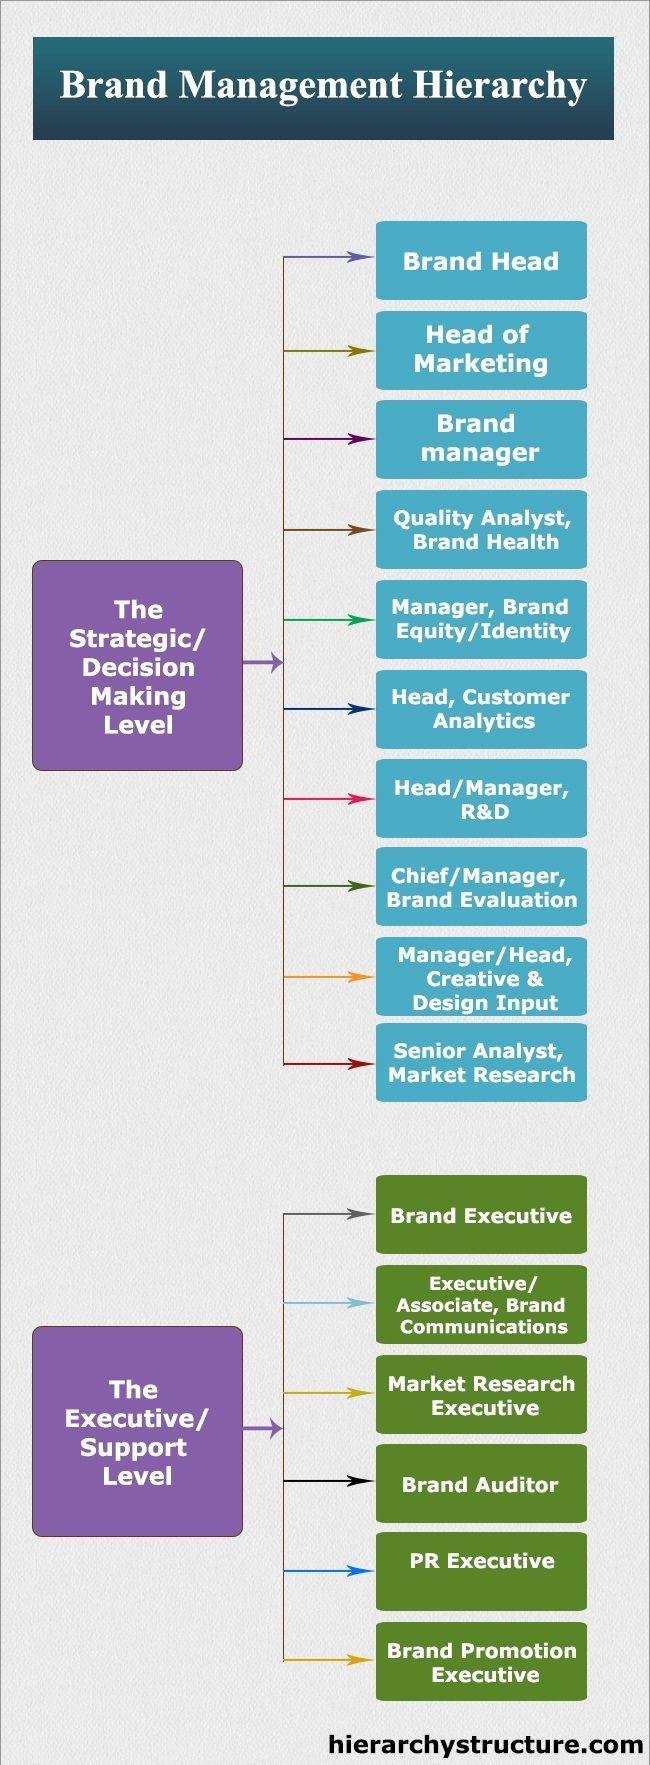 Brand Management Hierarchy - Via W Hail